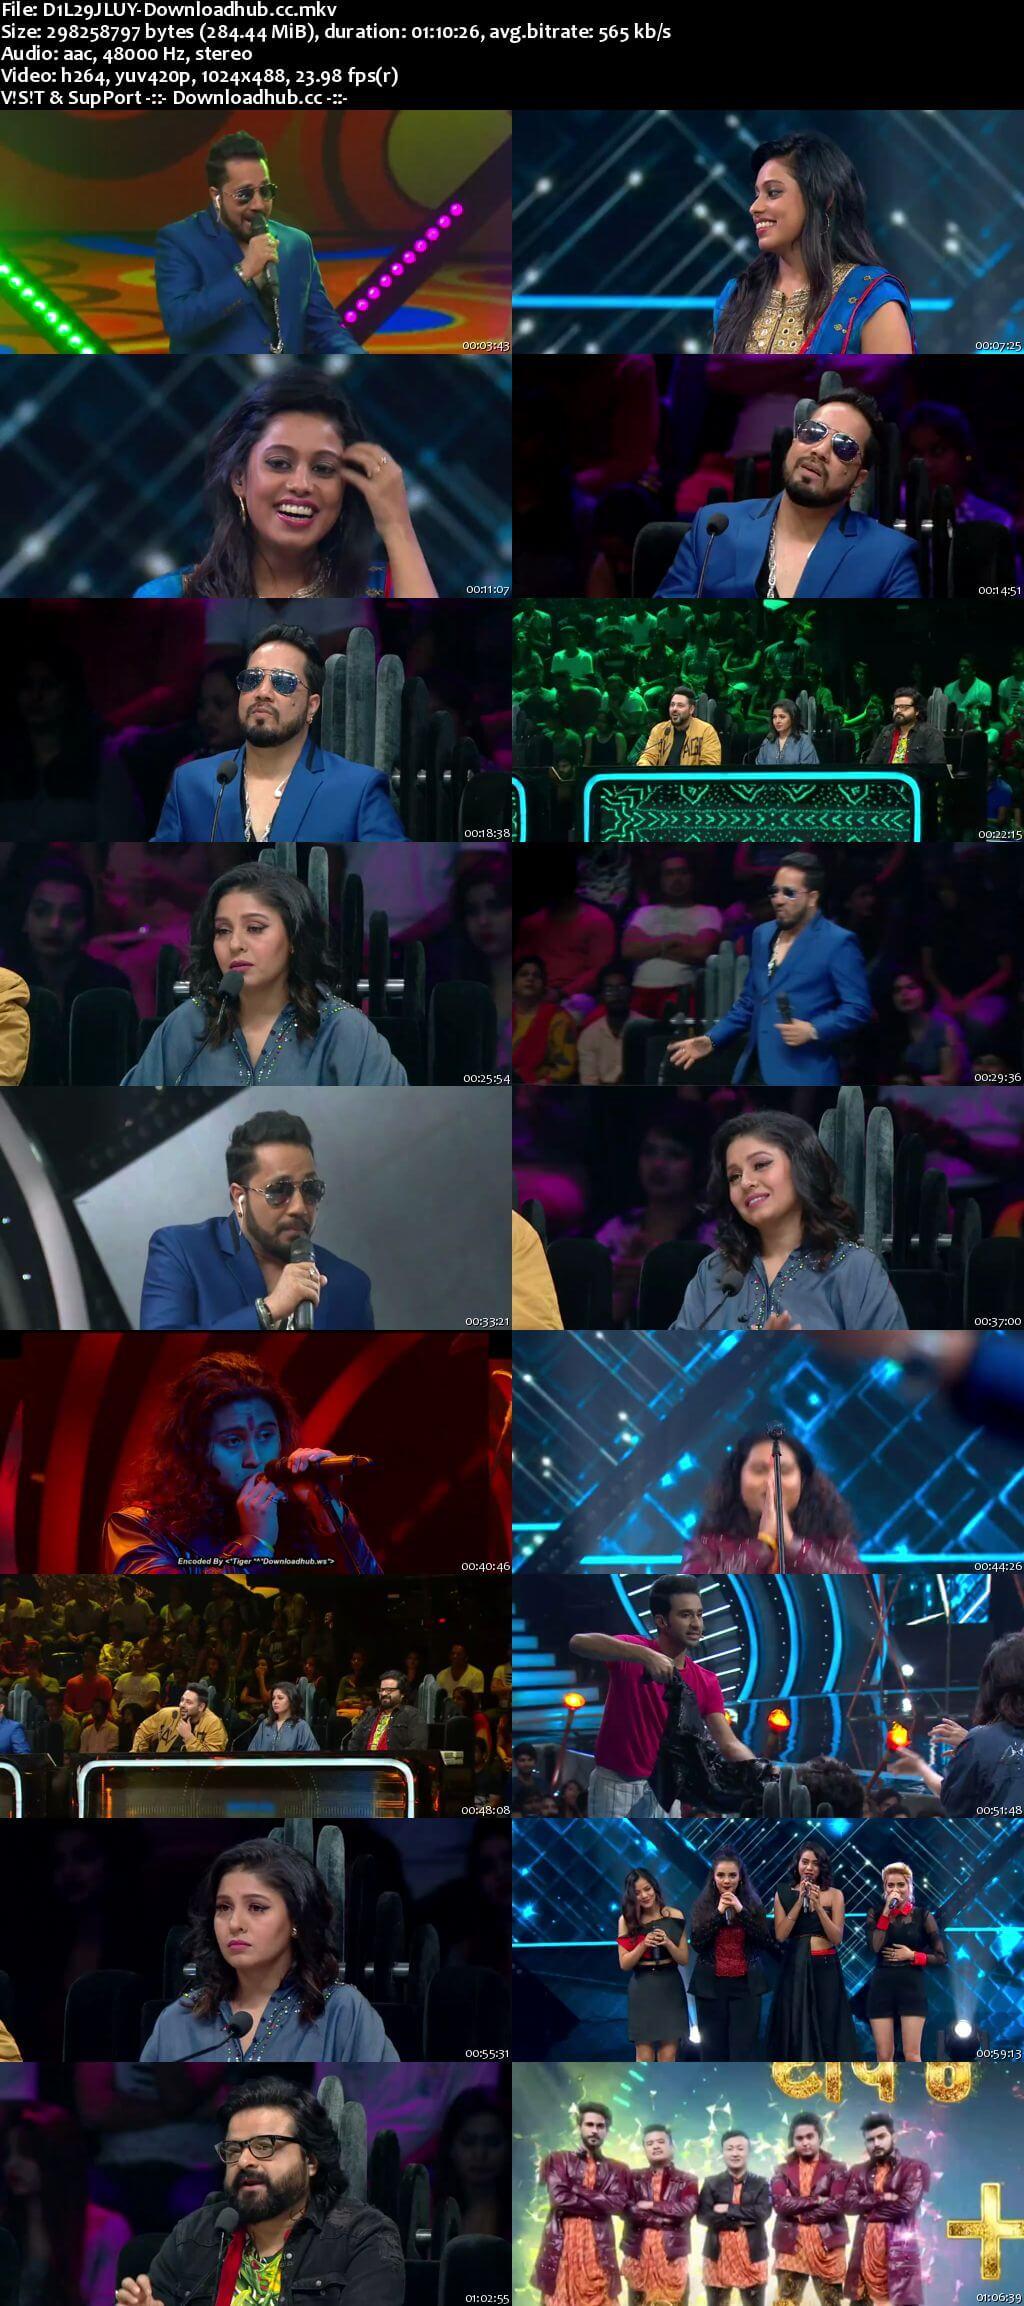 Dil Hai Hindustani 2 29 July 2018 Episode 08 HDTV 480p